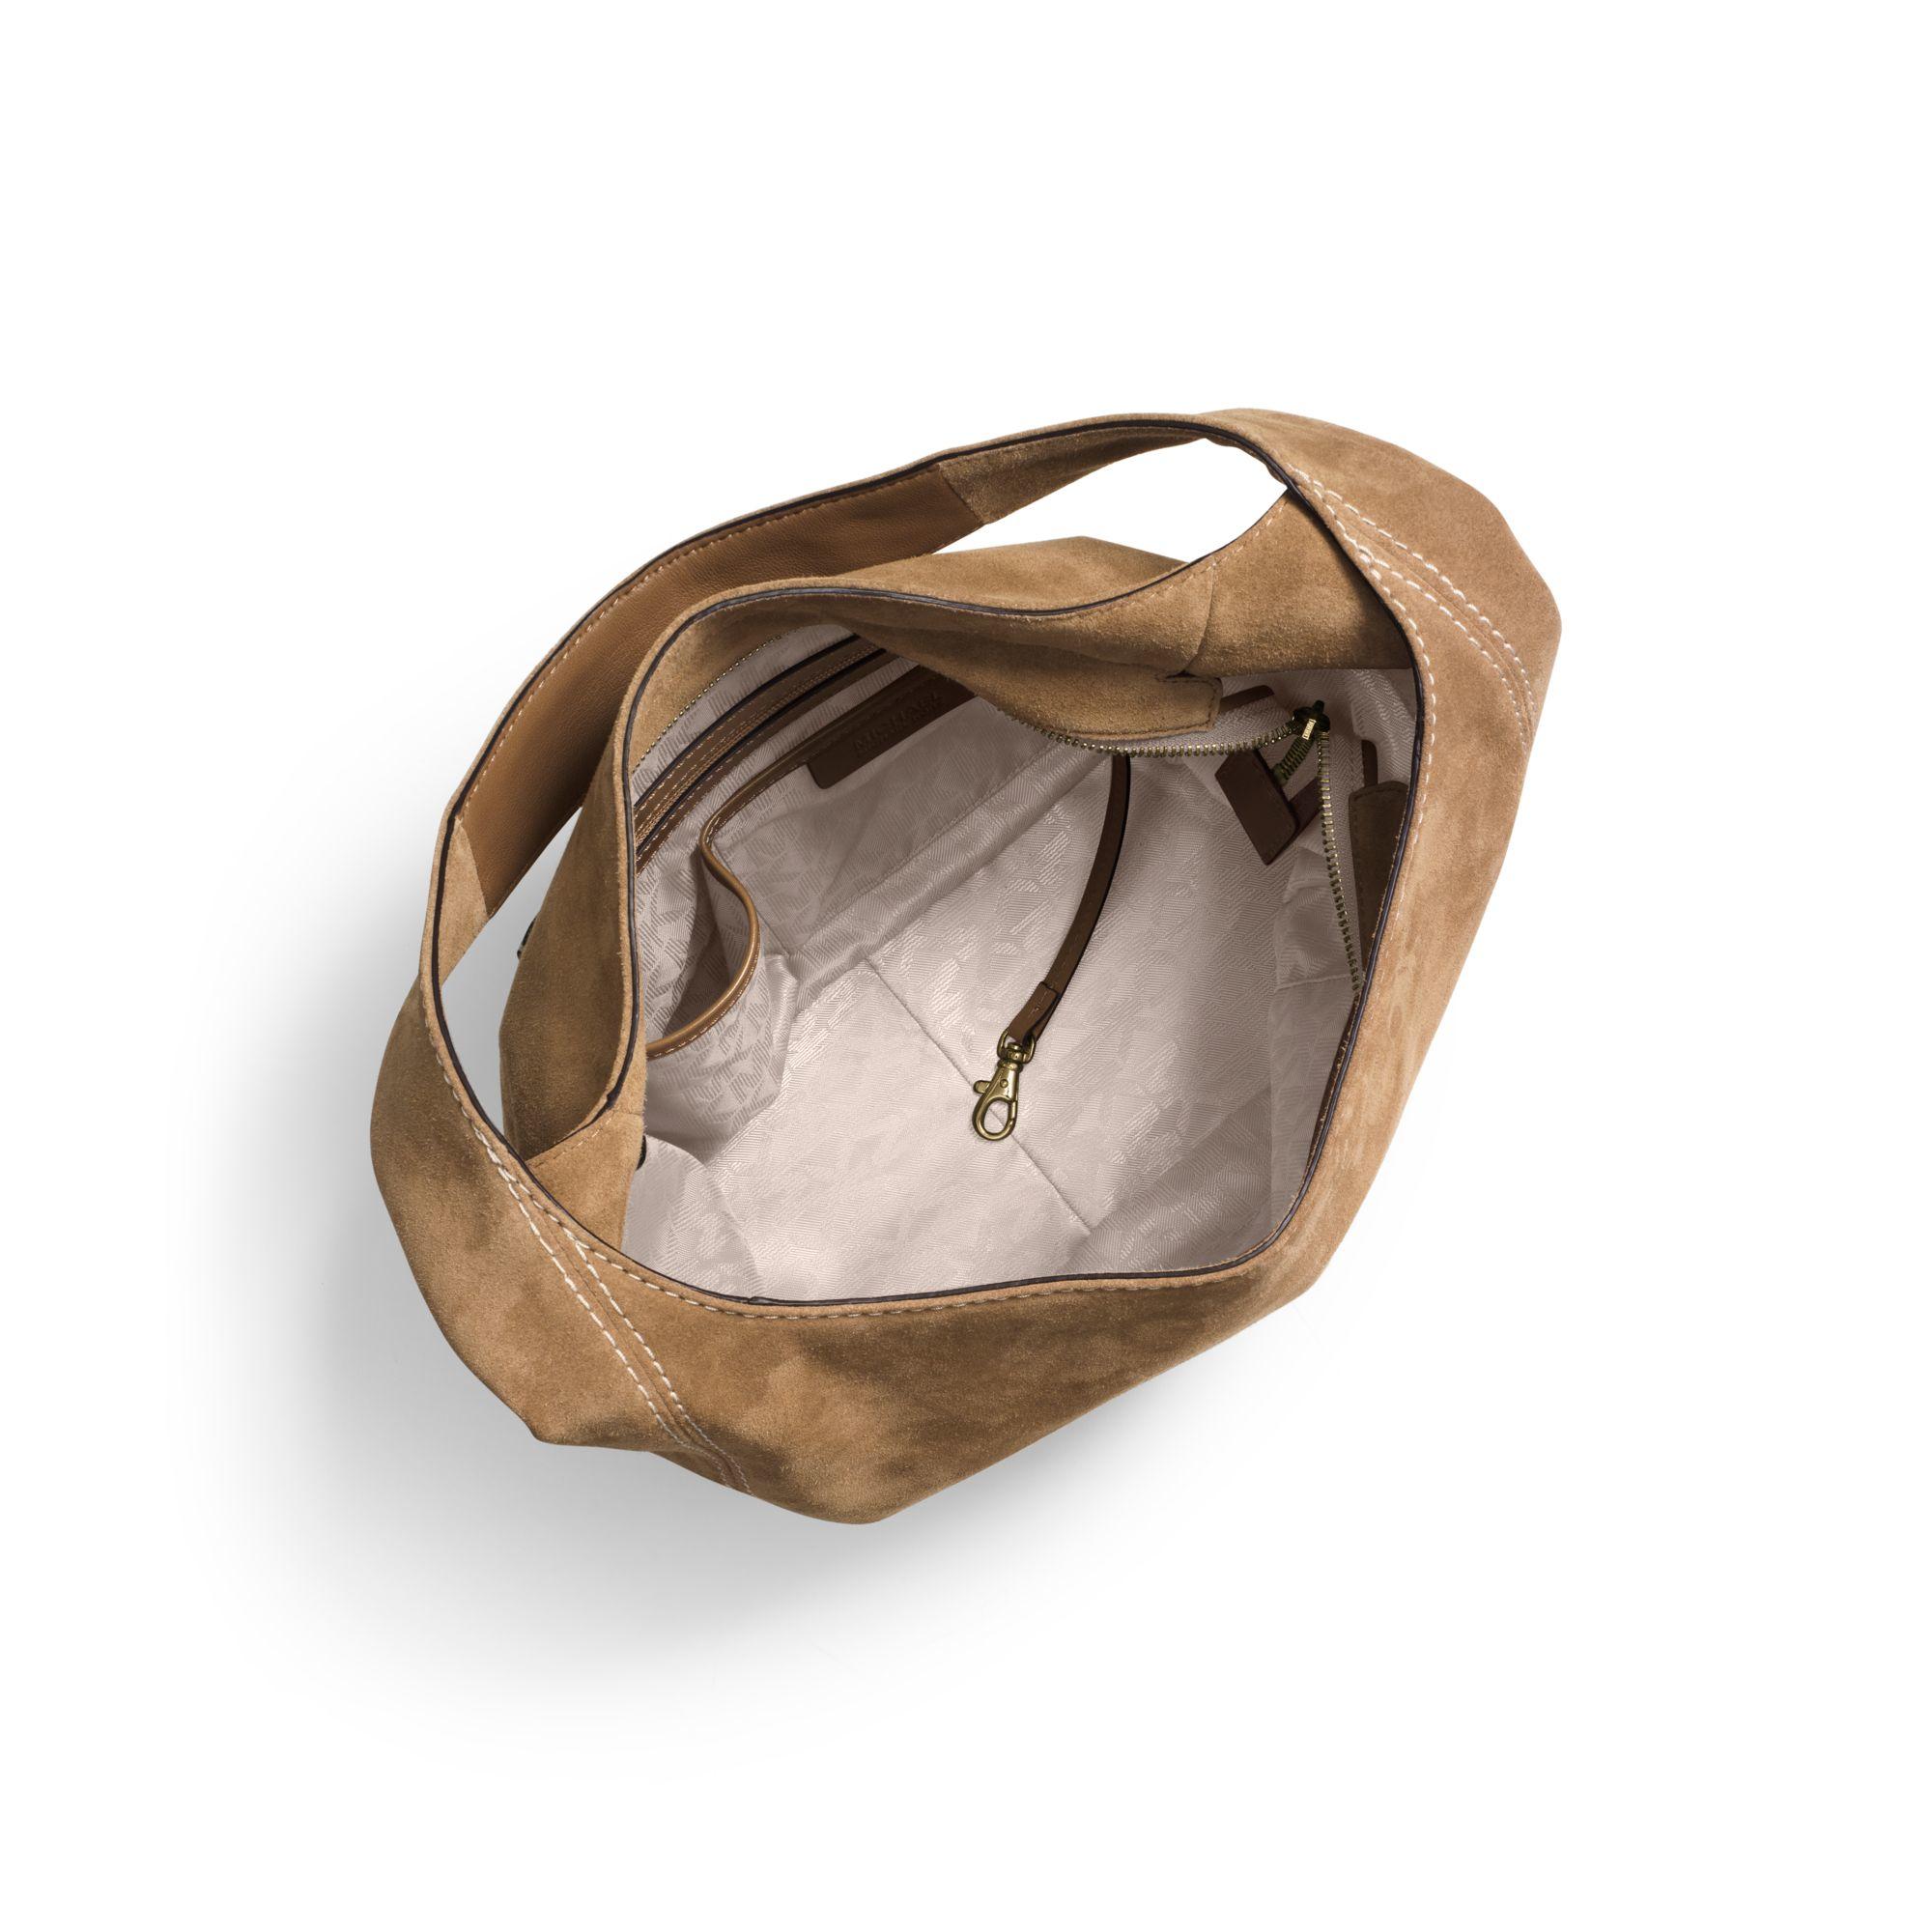 5e344cda00c0 Lyst - Michael Kors Lena Large Suede Shoulder Bag in Brown